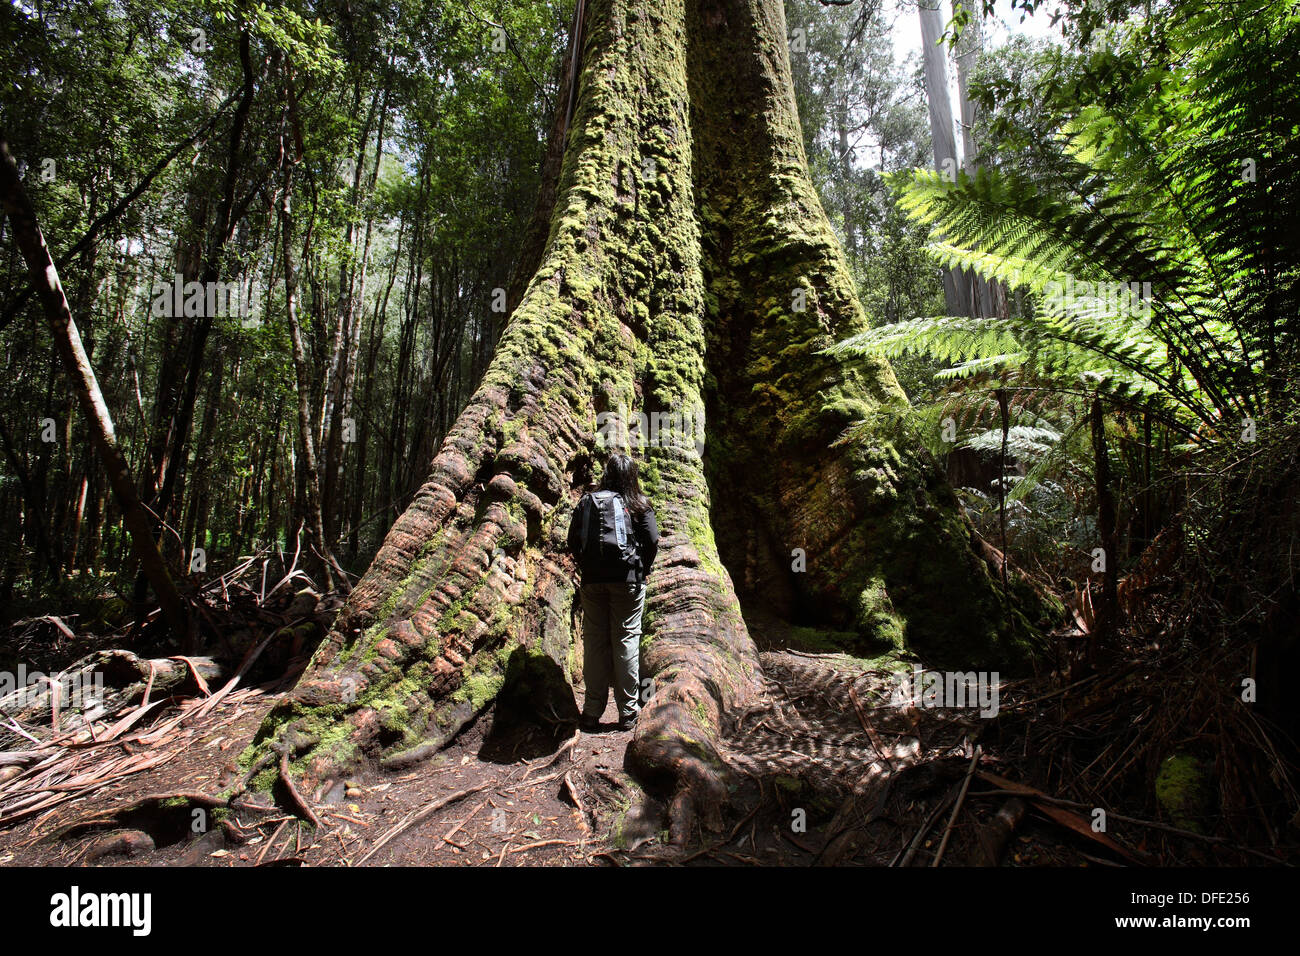 Swamp Gum Eucalyptus regnans, one of the tallest tree species in the world  Mt Field National Park  Tasmania, Australia - Stock Image